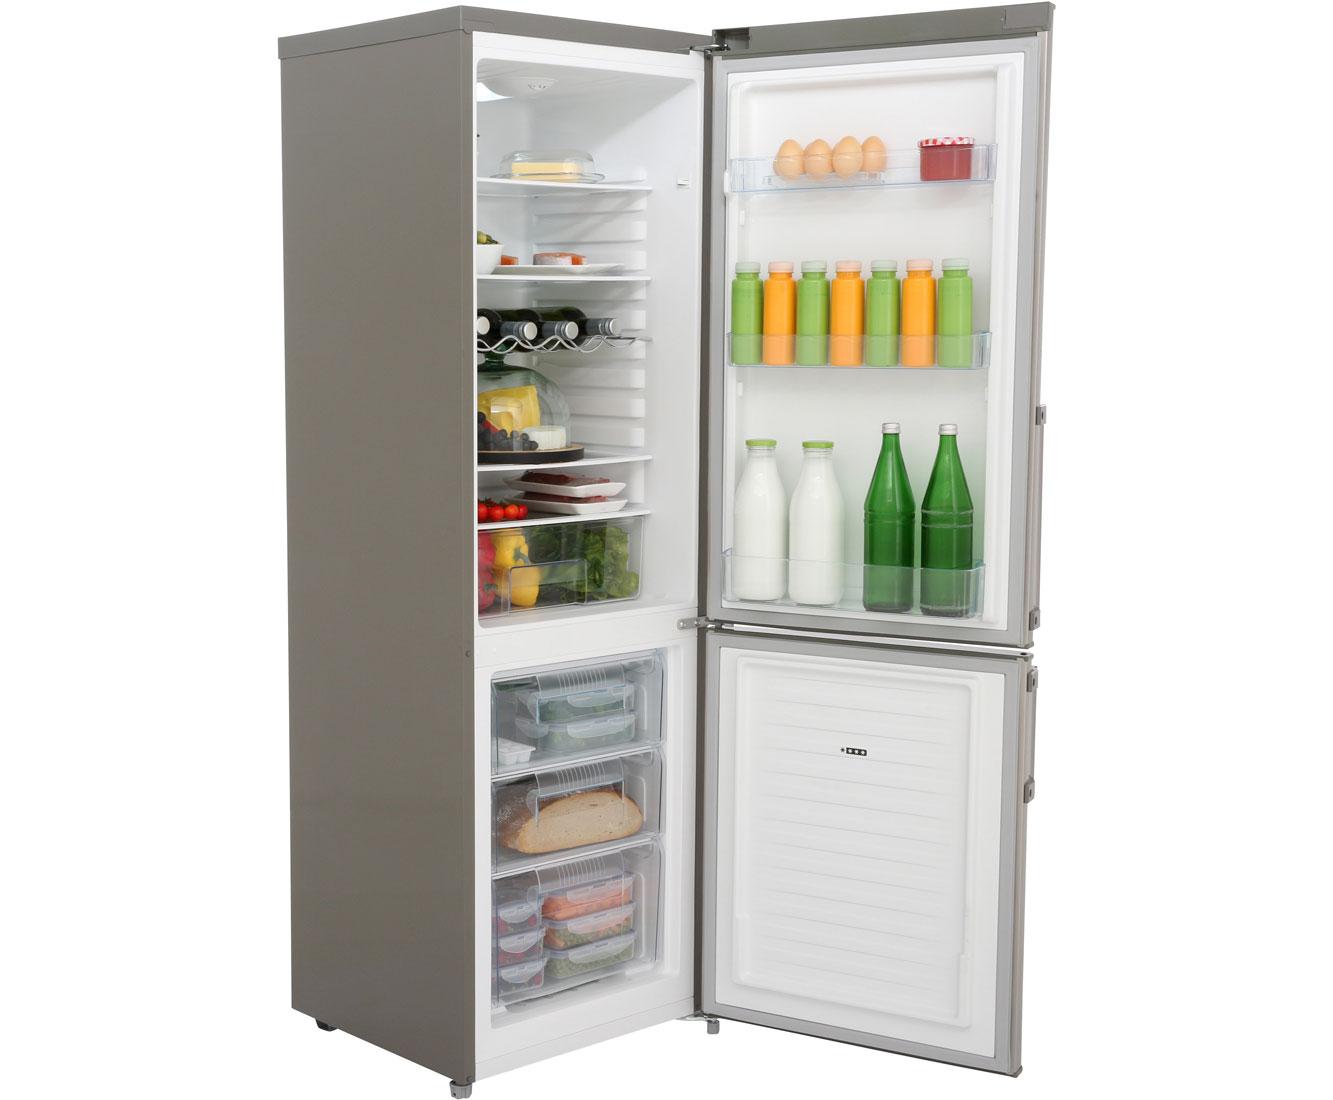 Amica Kühlschrank Inbetriebnahme : Amica kühlschrank inbetriebnahme kühlschrank anschließen u das